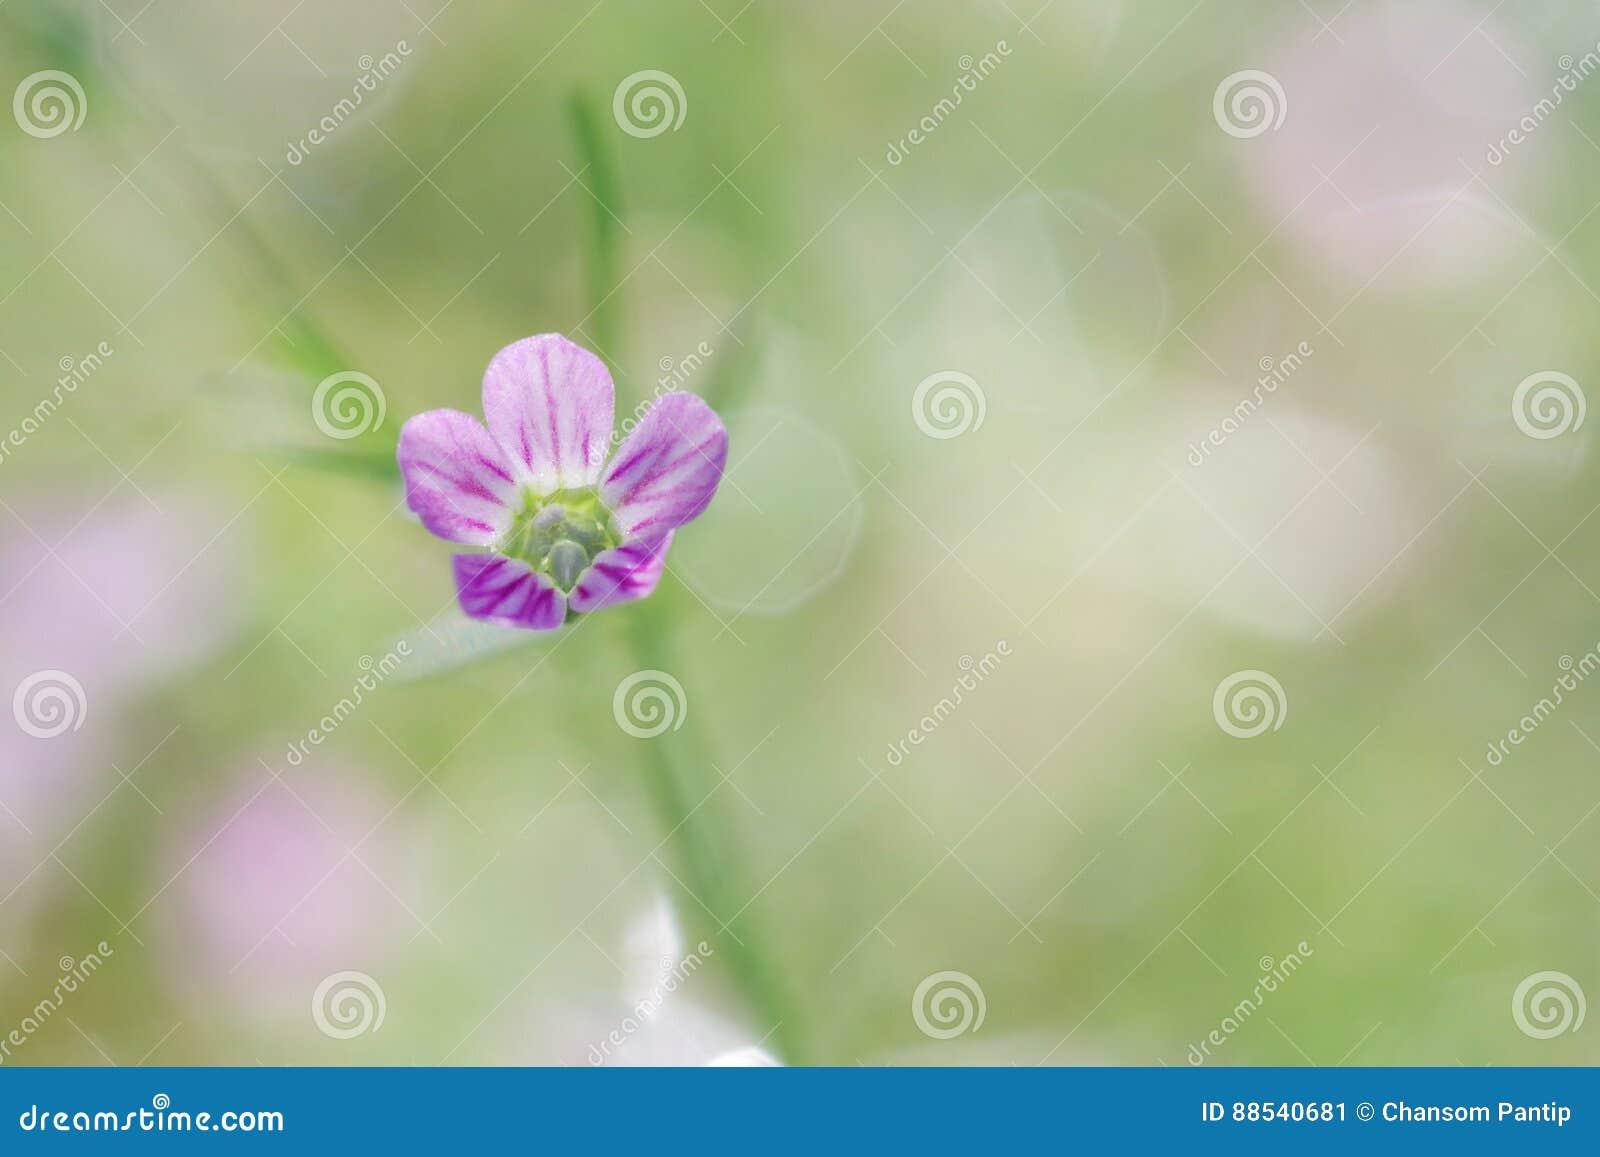 Gypsophila spring flower bloom, macro shot on sweet soft green-pink background with bokeh.